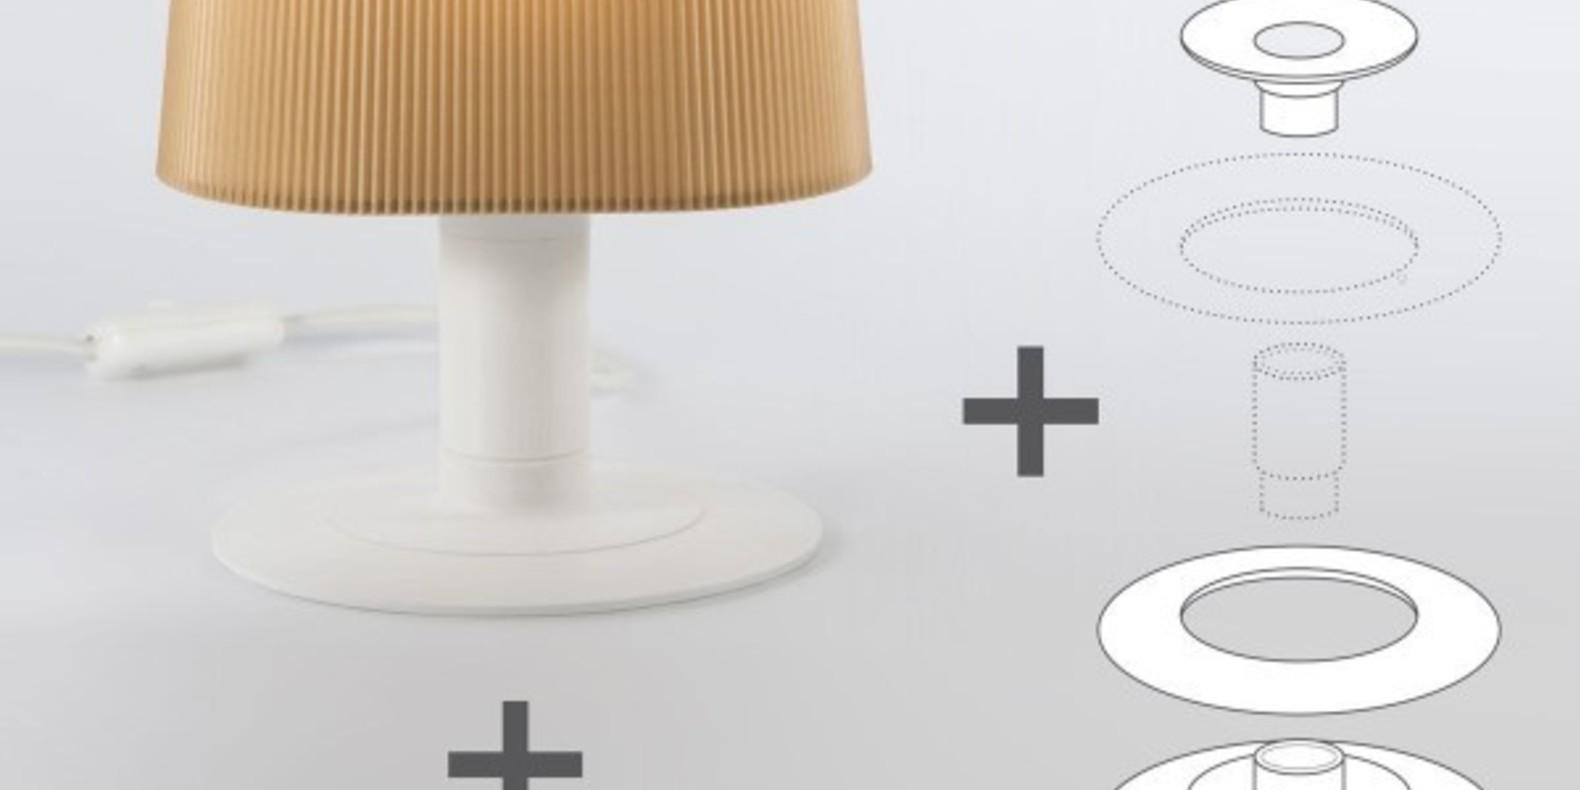 http://fichier3d.fr/wp-content/uploads/2016/04/lampe-porte-casque-capsules-nespresso-ipad-eumakers-bobines-spools-filament-impression-3D-fichier-3D-eumakeit-STL-cults-2.jpg